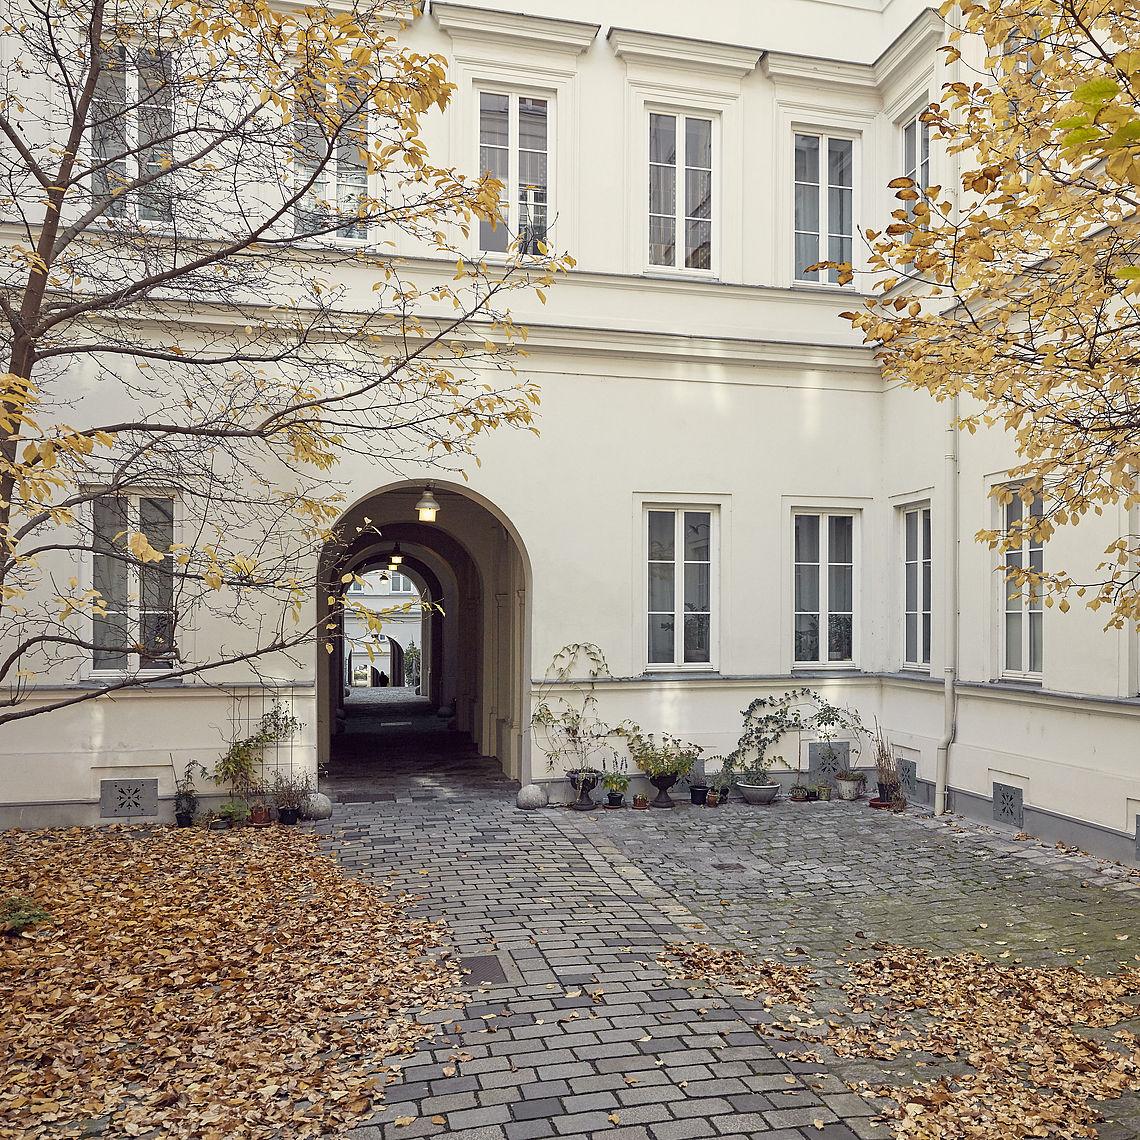 S IMMO Wohnimmobilie Adlerhof in Wien